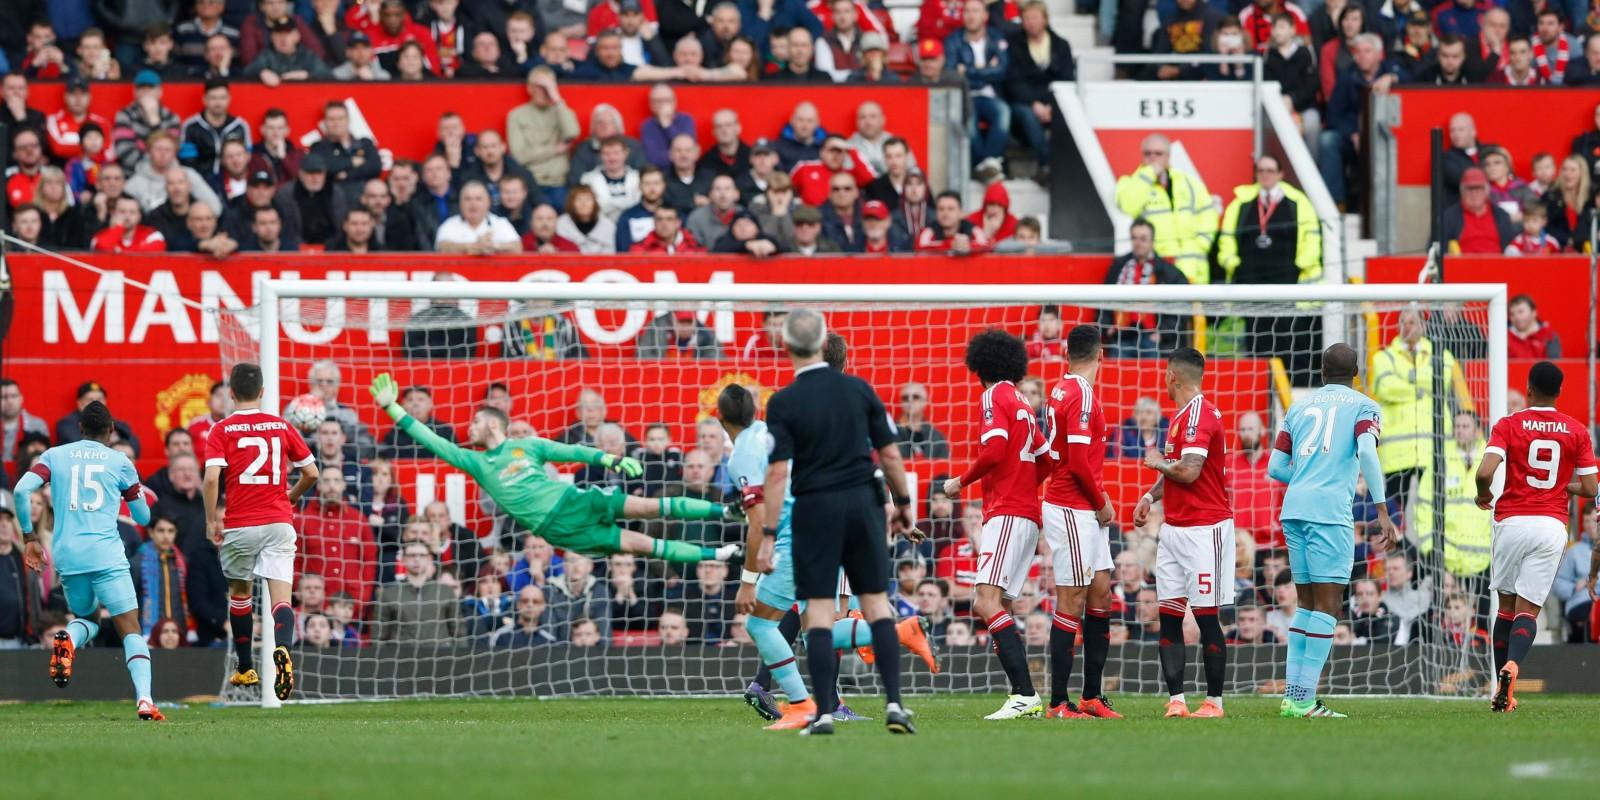 FA cup 5. runde: Man Utd – West Ham